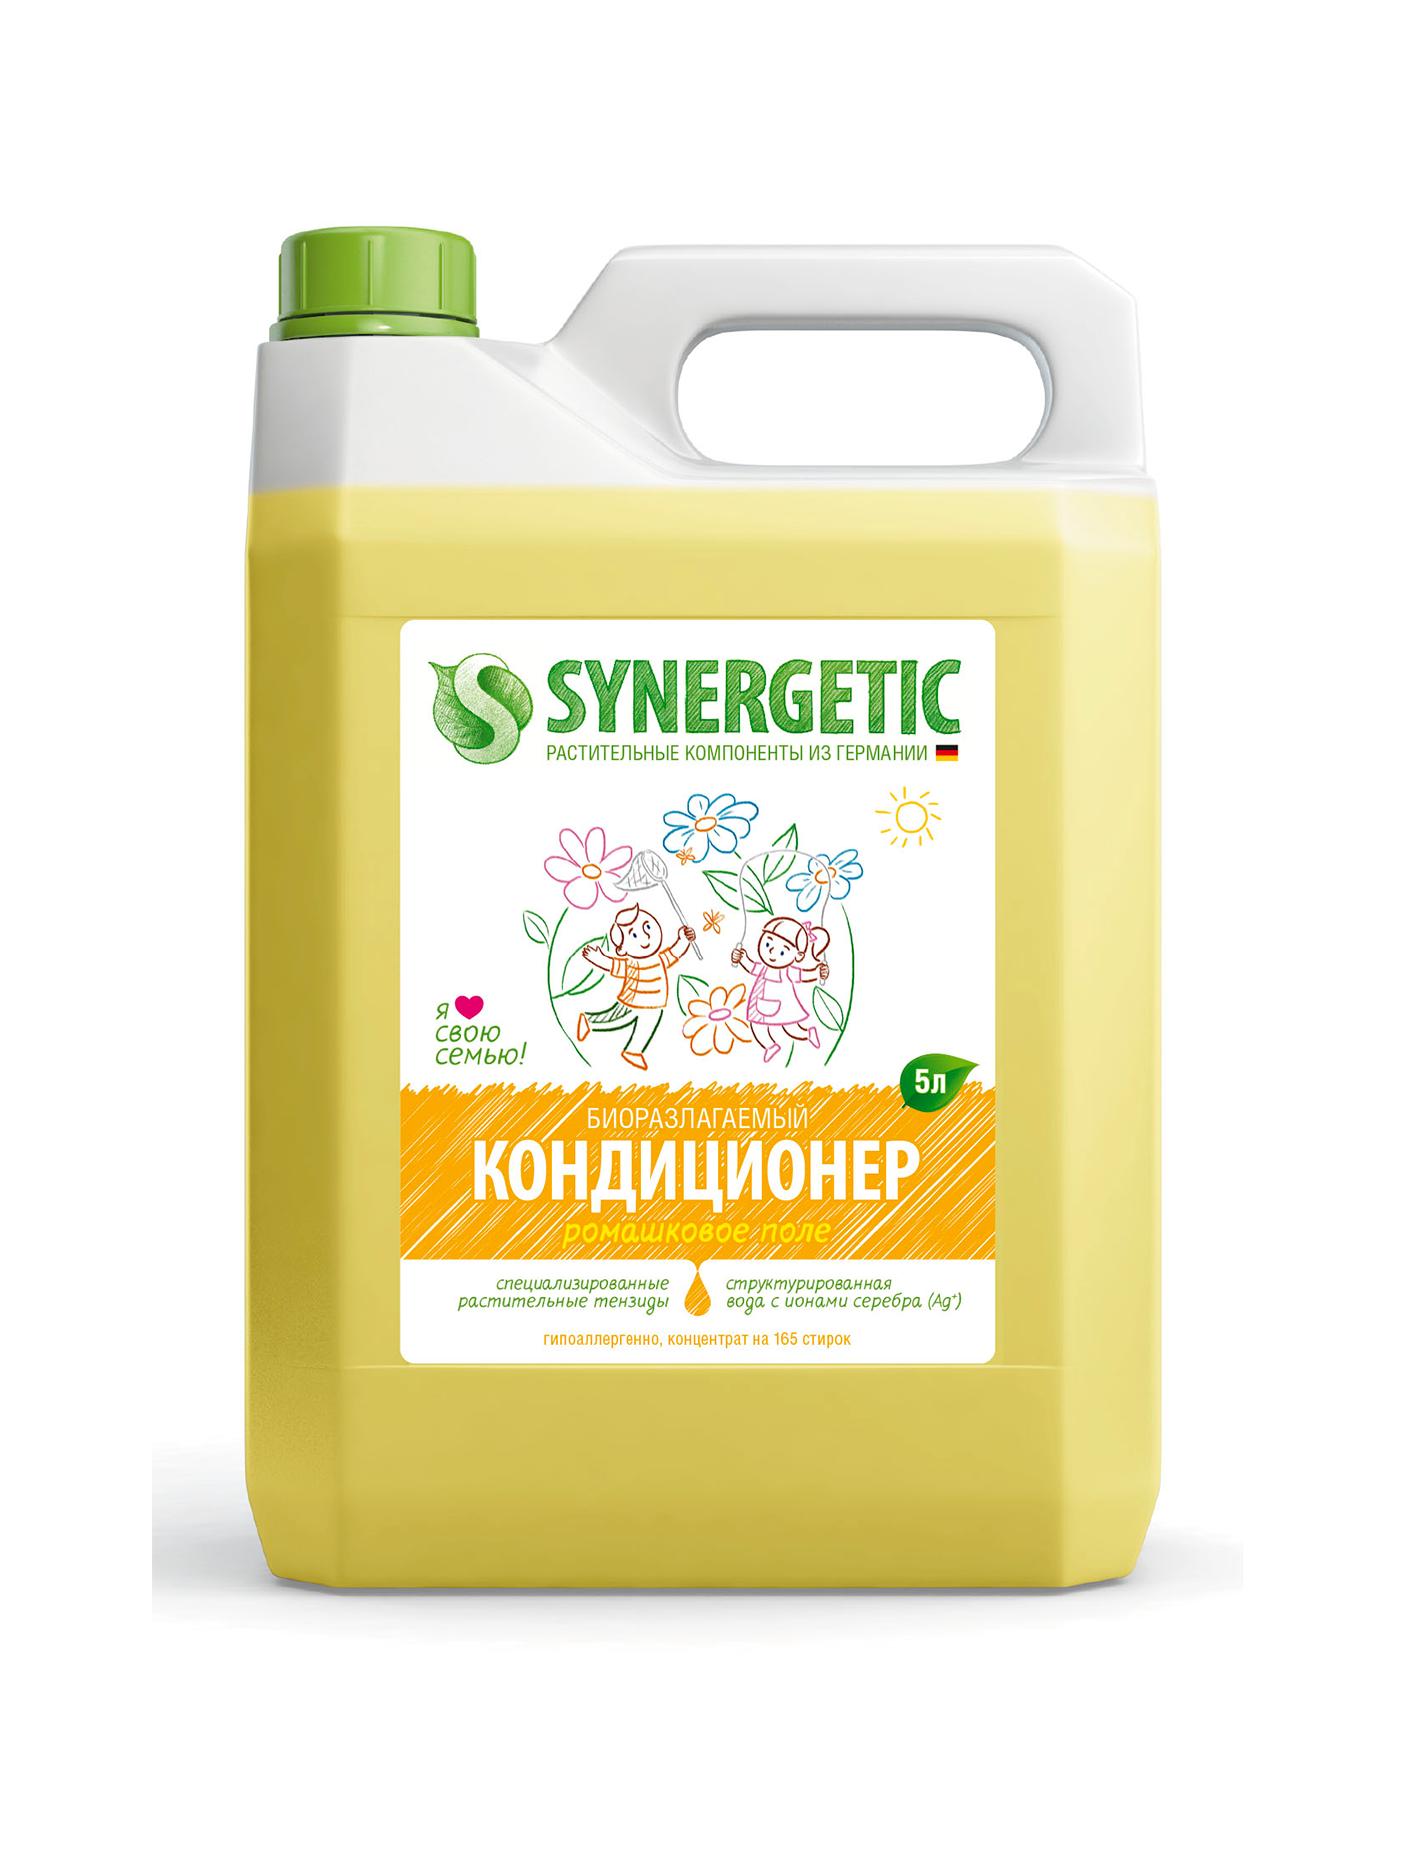 Средства для стирки Synergetic Кондиционер для белья Synergetic «Цветочная фантазия» 5 л кондиционер для белья synergetic 5 л